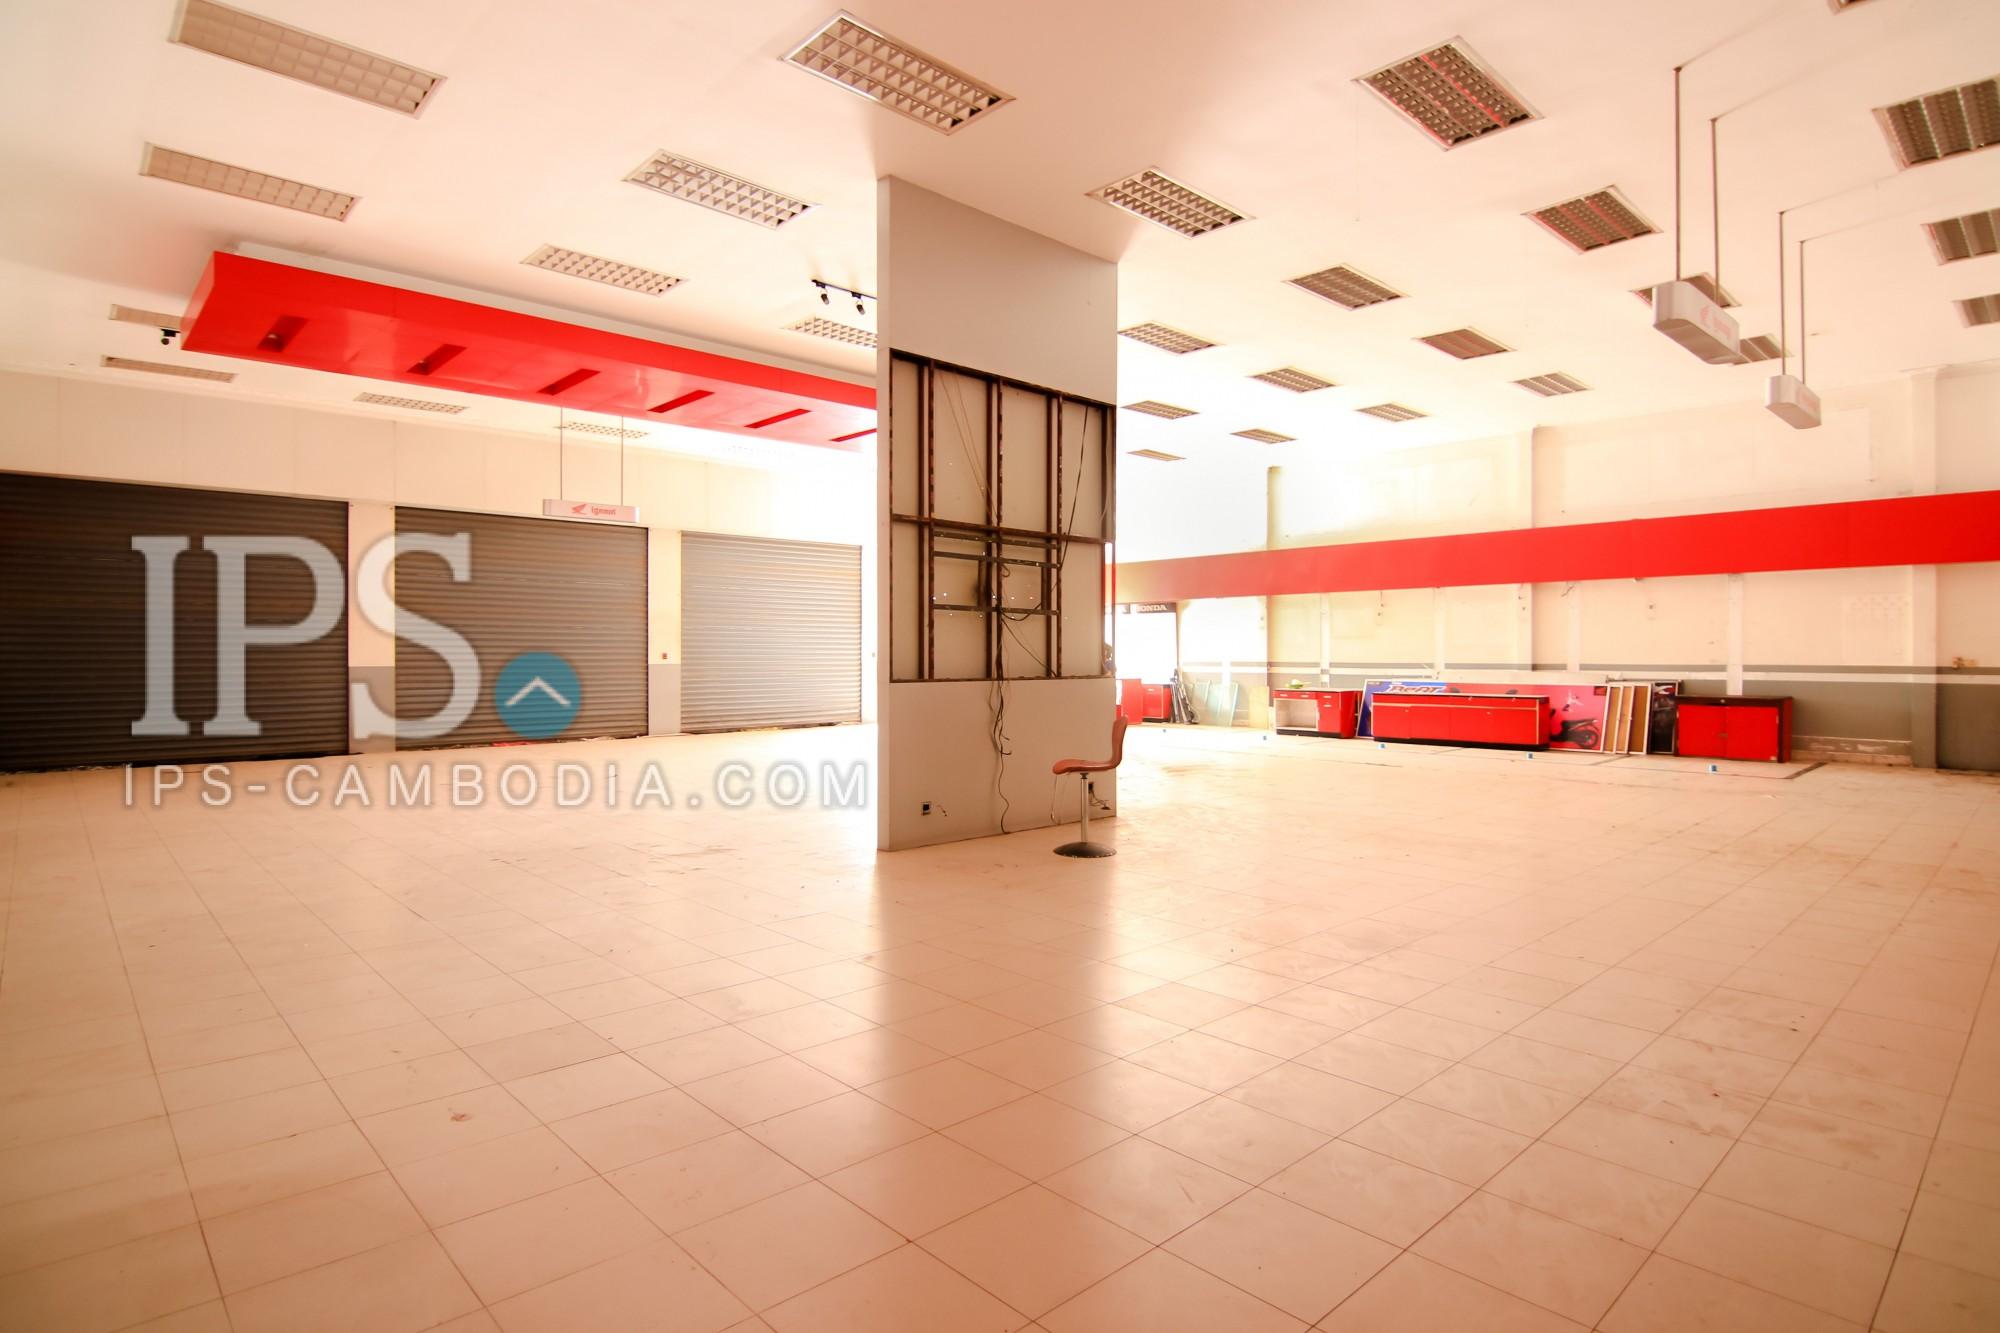 442 Sqm Commercial Shop-house for Rent - Boeung Trabek, Phnom Penh